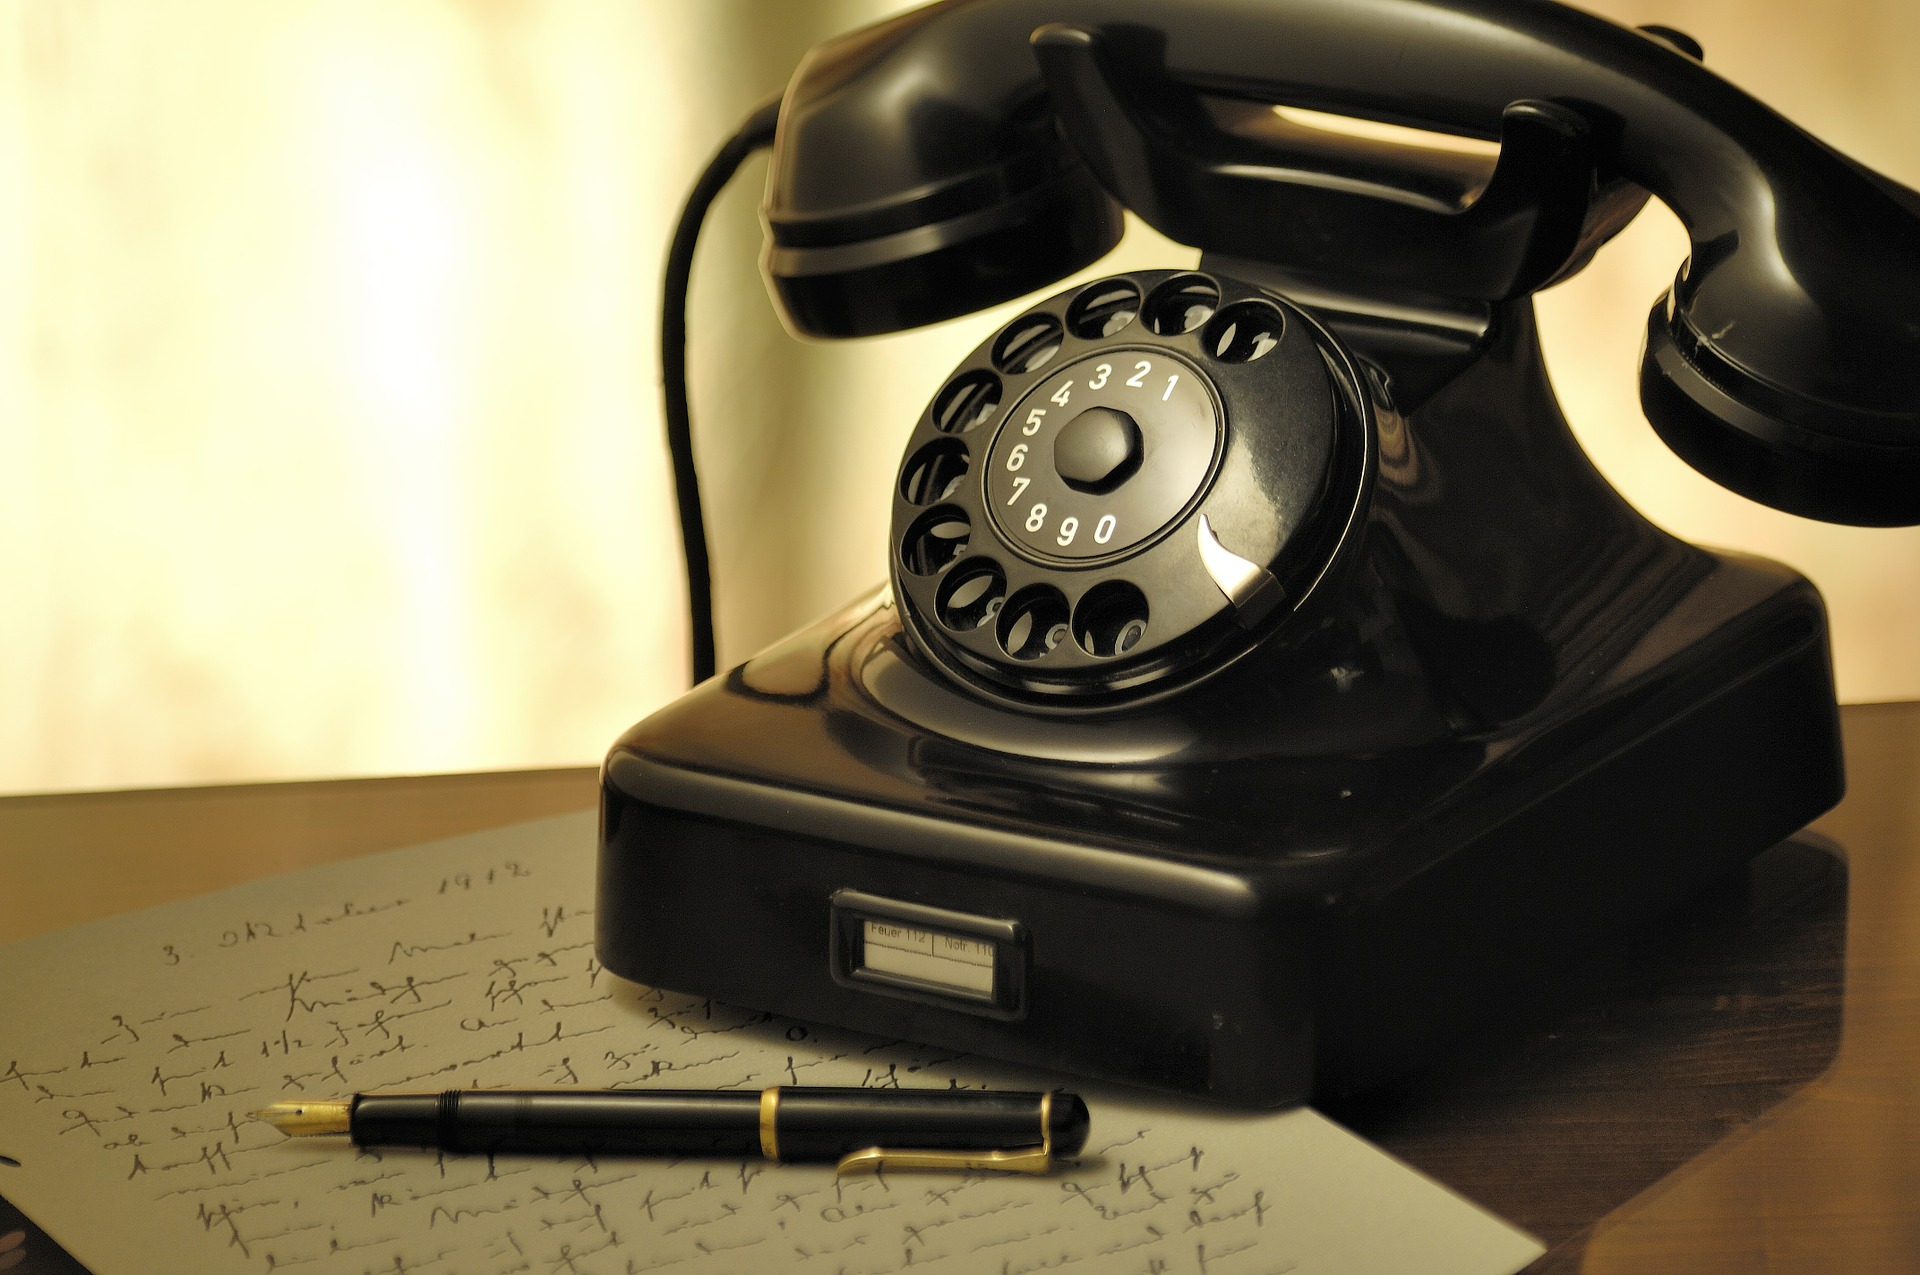 KABITEC-IT Telefon